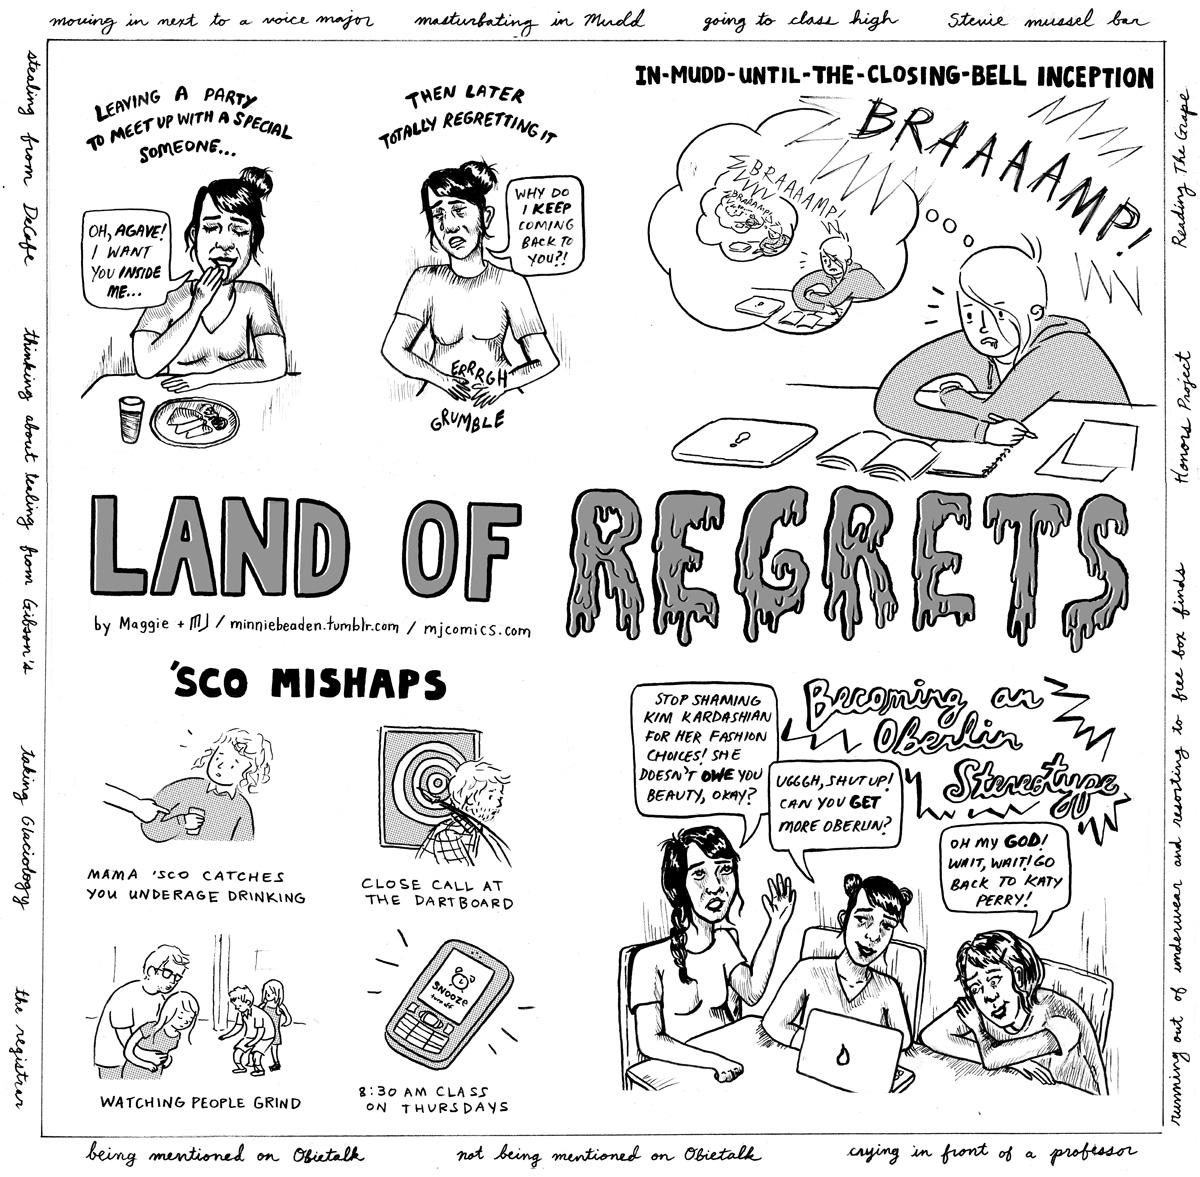 Land of Regrets